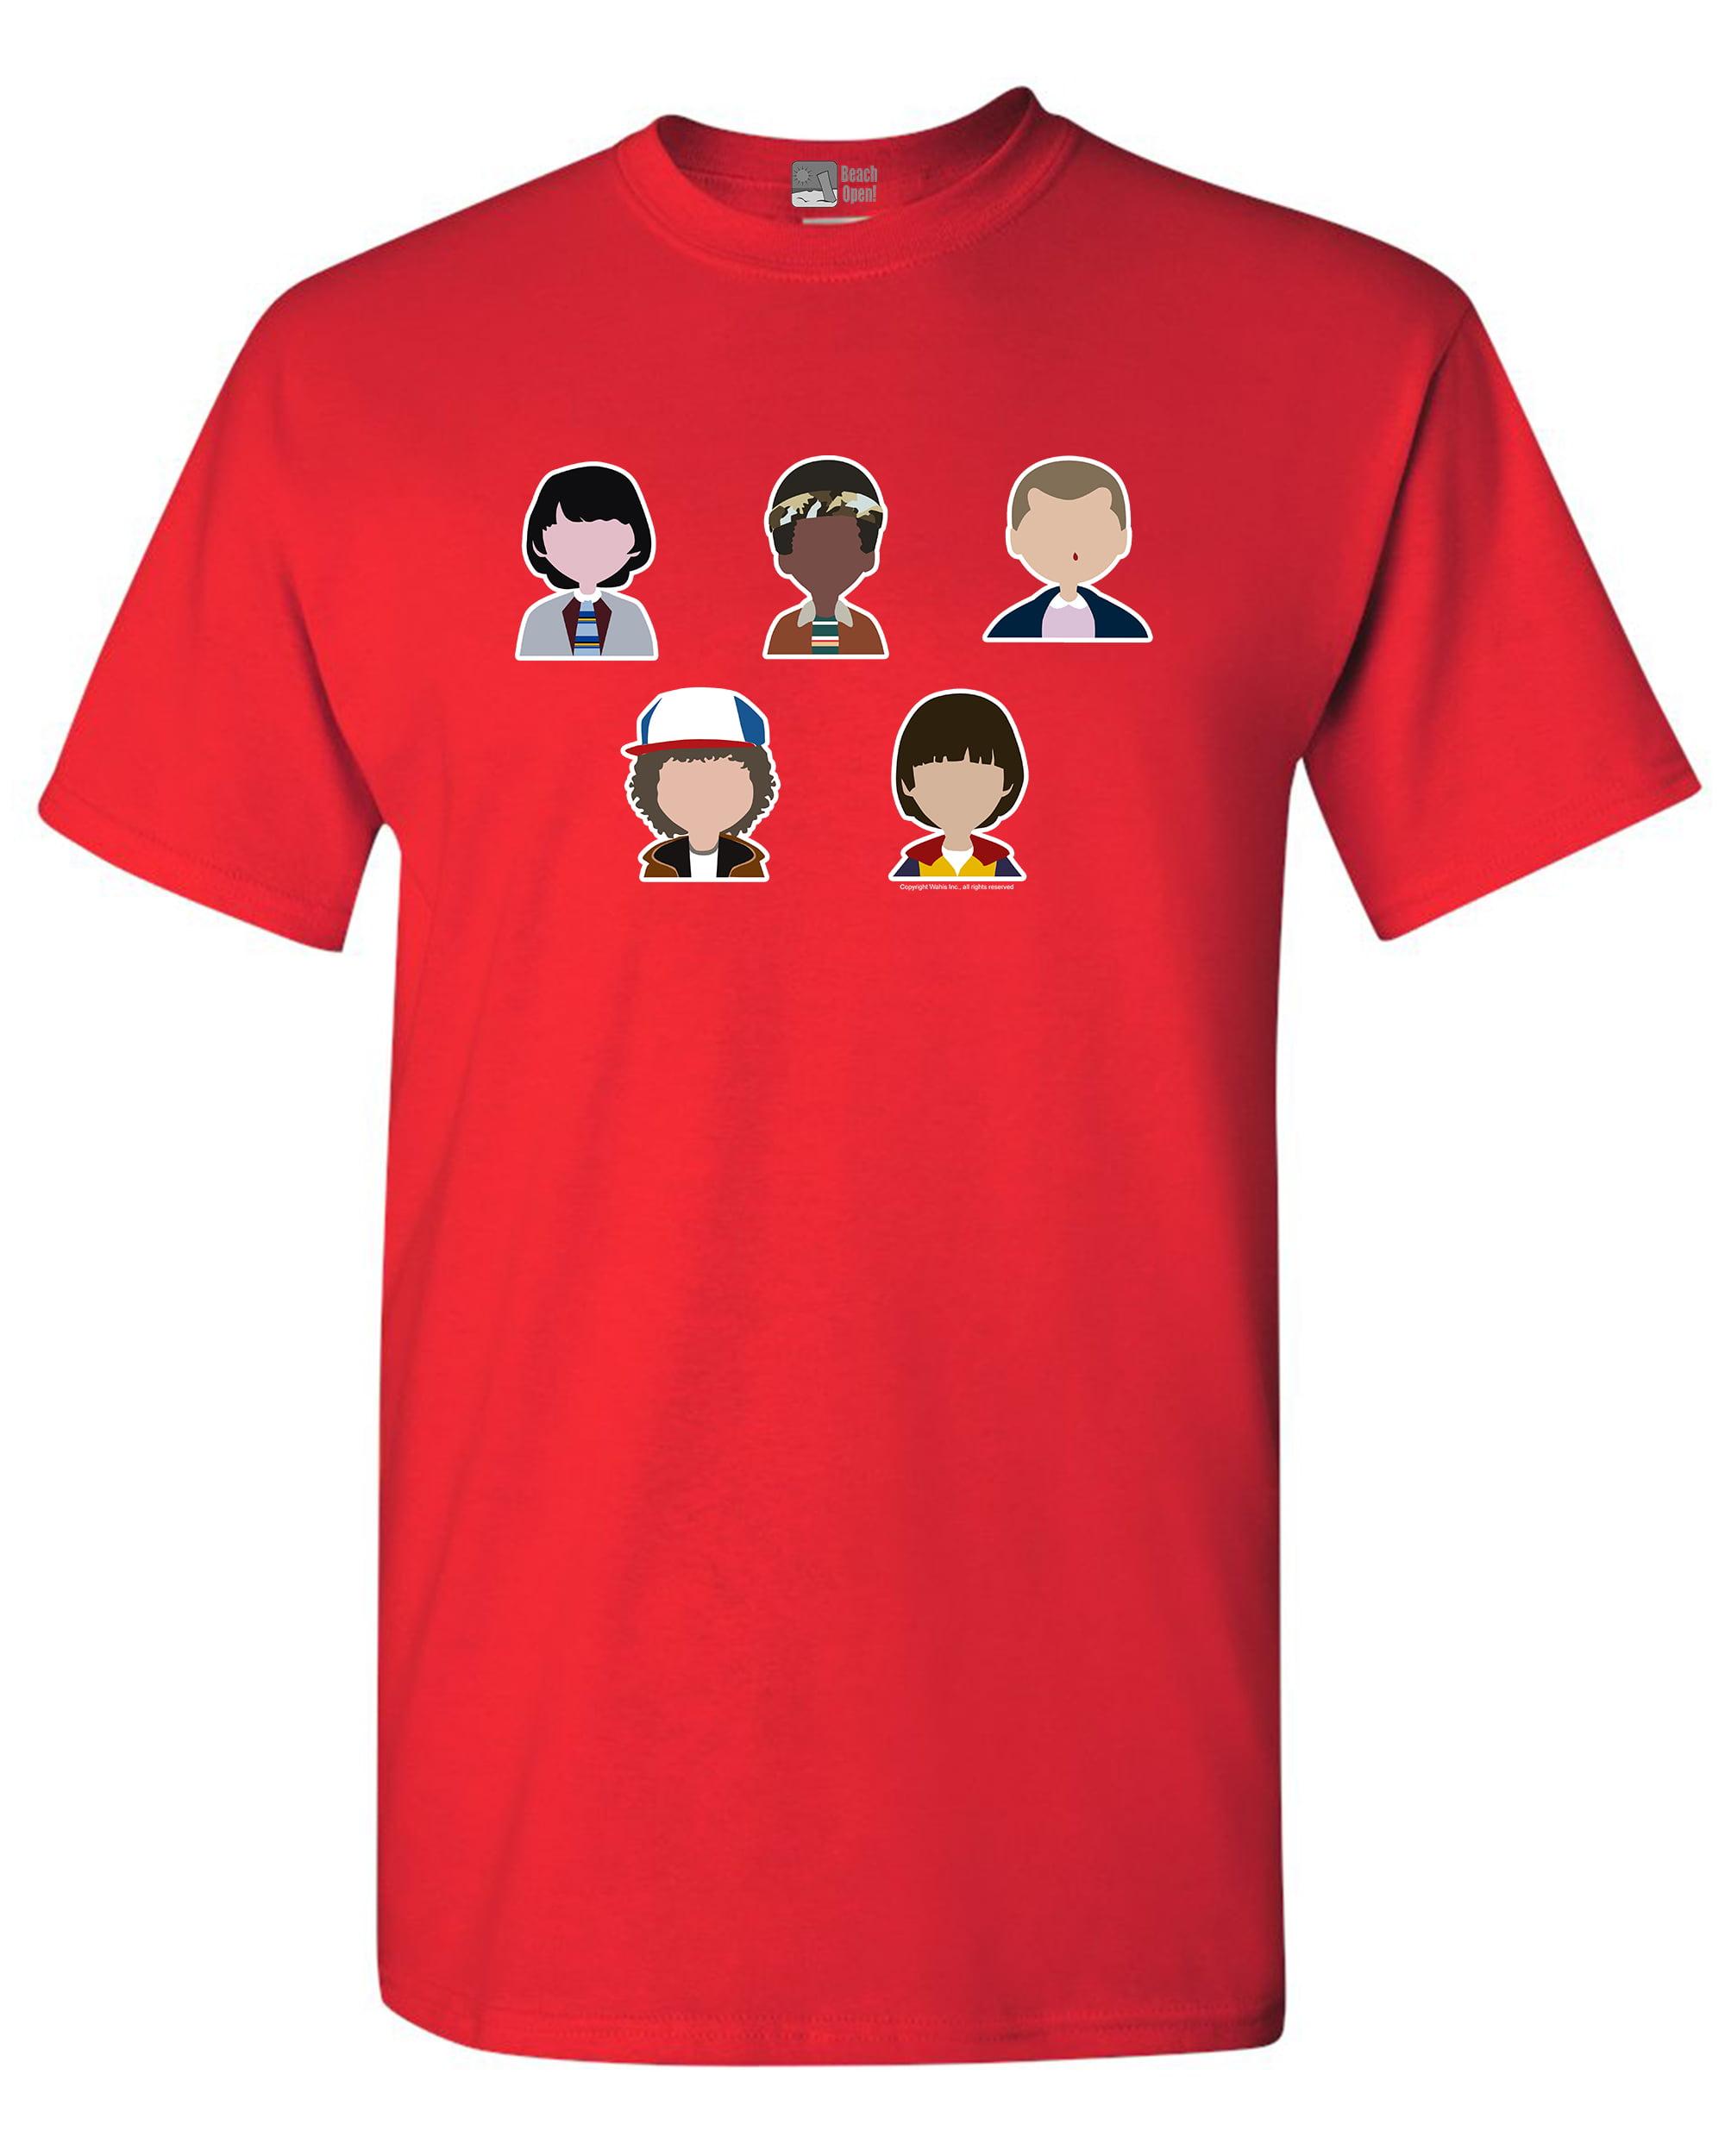 Stranger Character Supernatural Horror Parody Funny Adult DT T-Shirt Tee